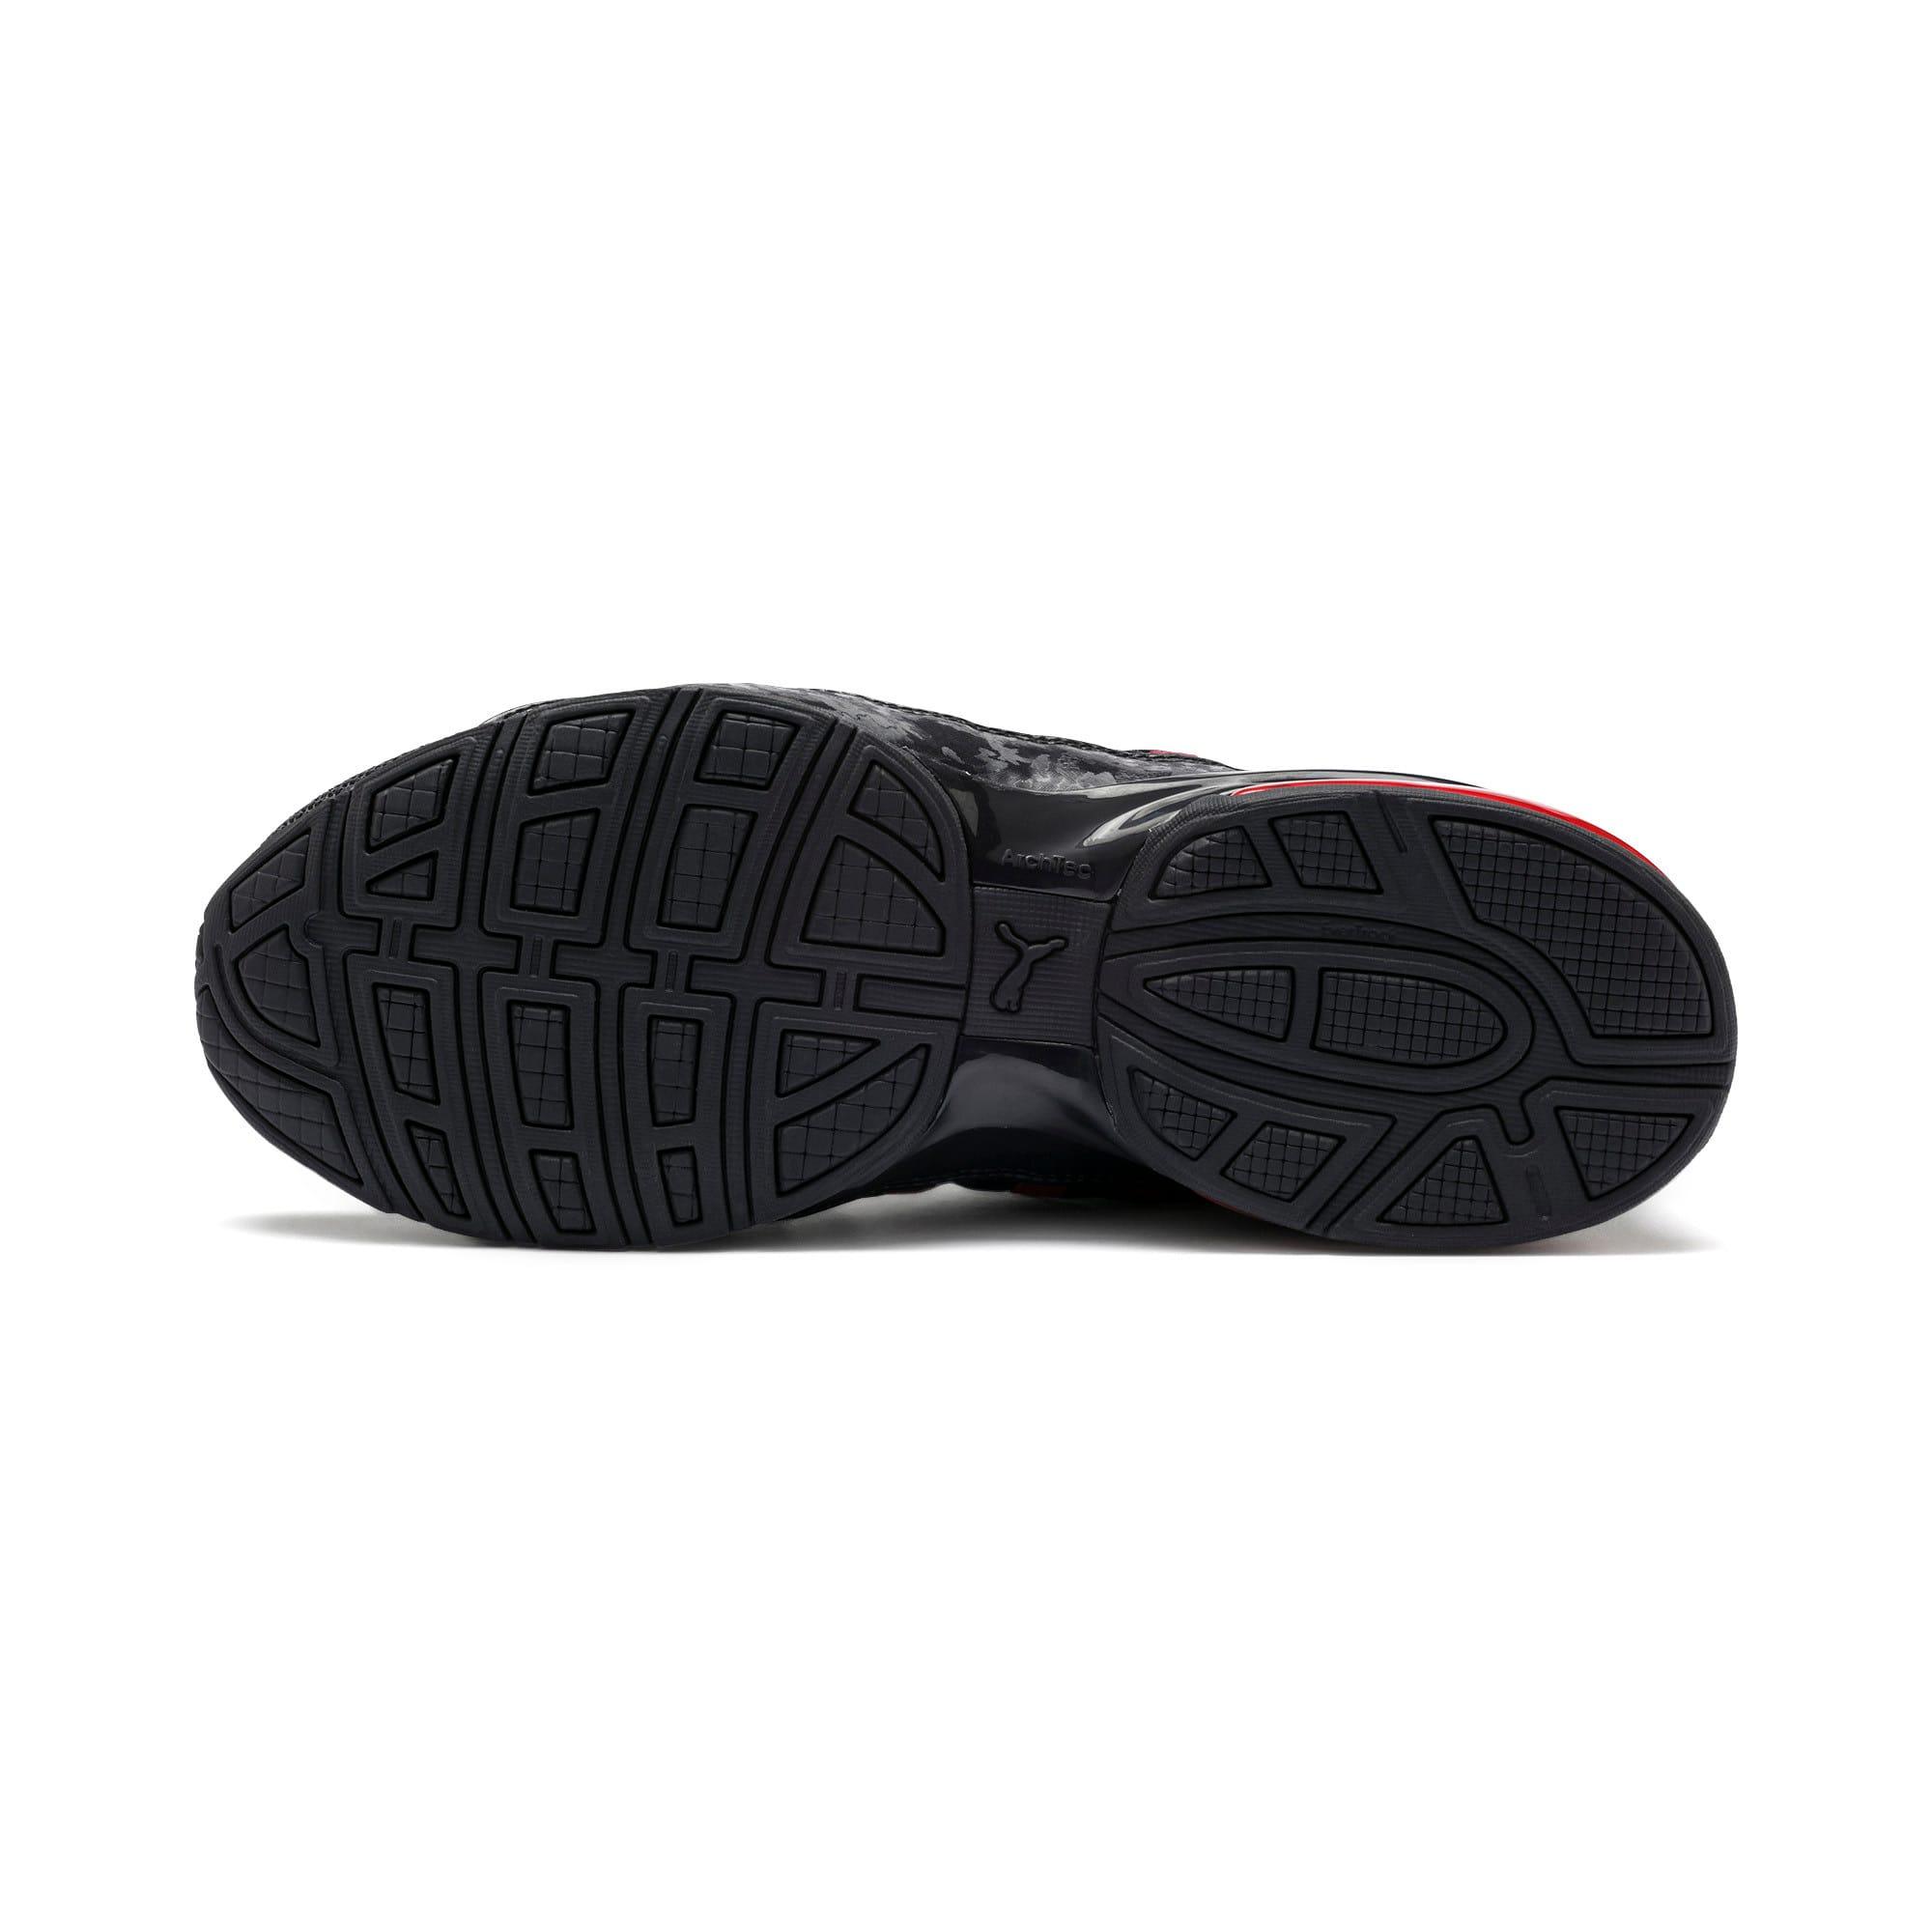 Miniatura 5 de Zapatos de entrenamiento CELL Regulate Camo para hombre, Puma Black-Rhubarb, mediano